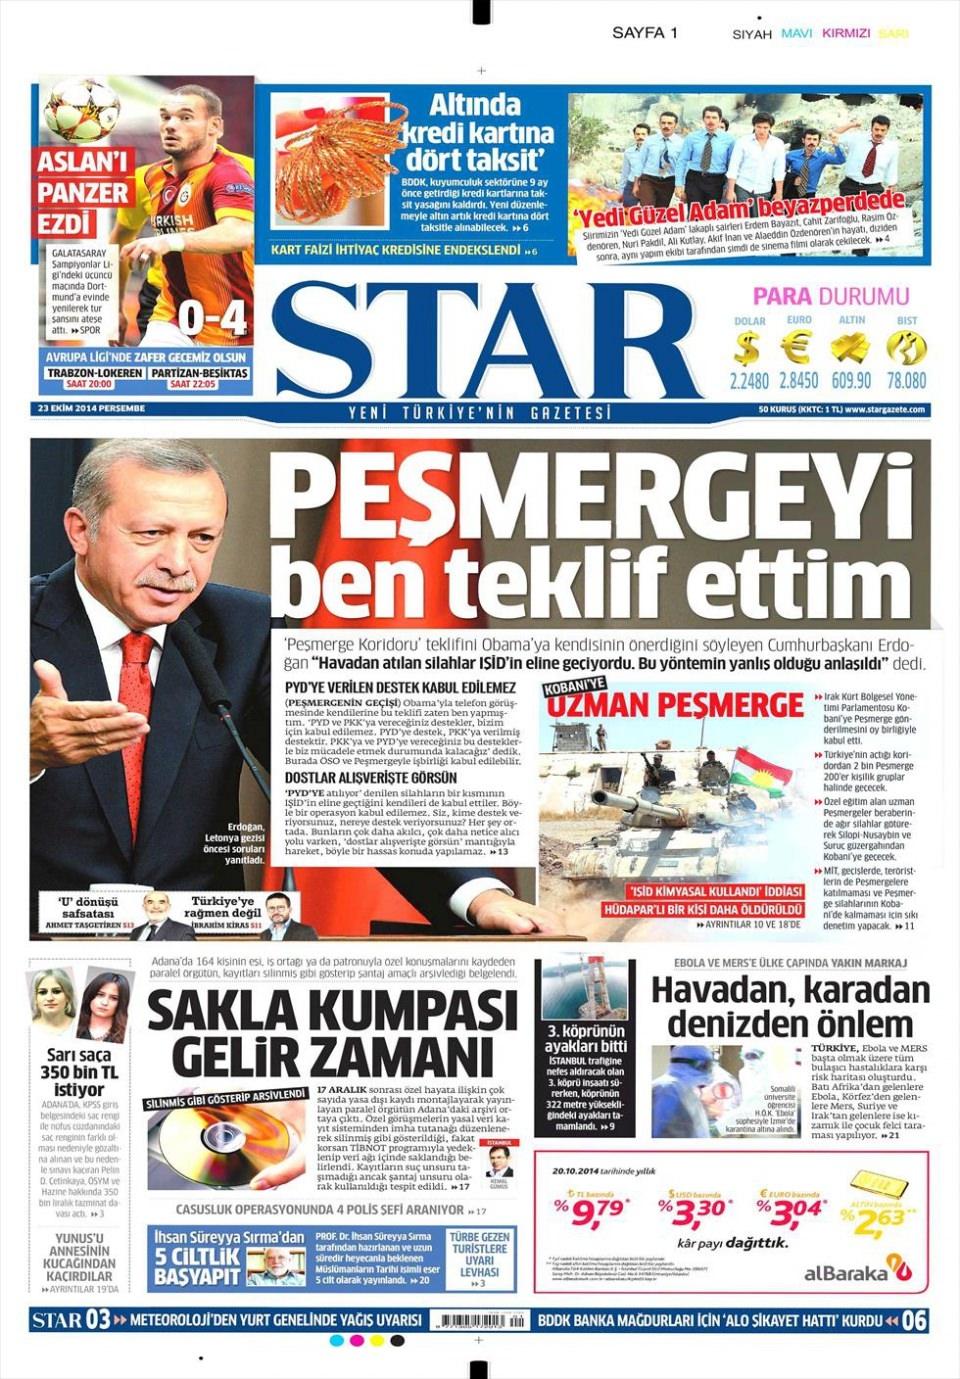 23 Ekim 2014 gazete manşetleri 16